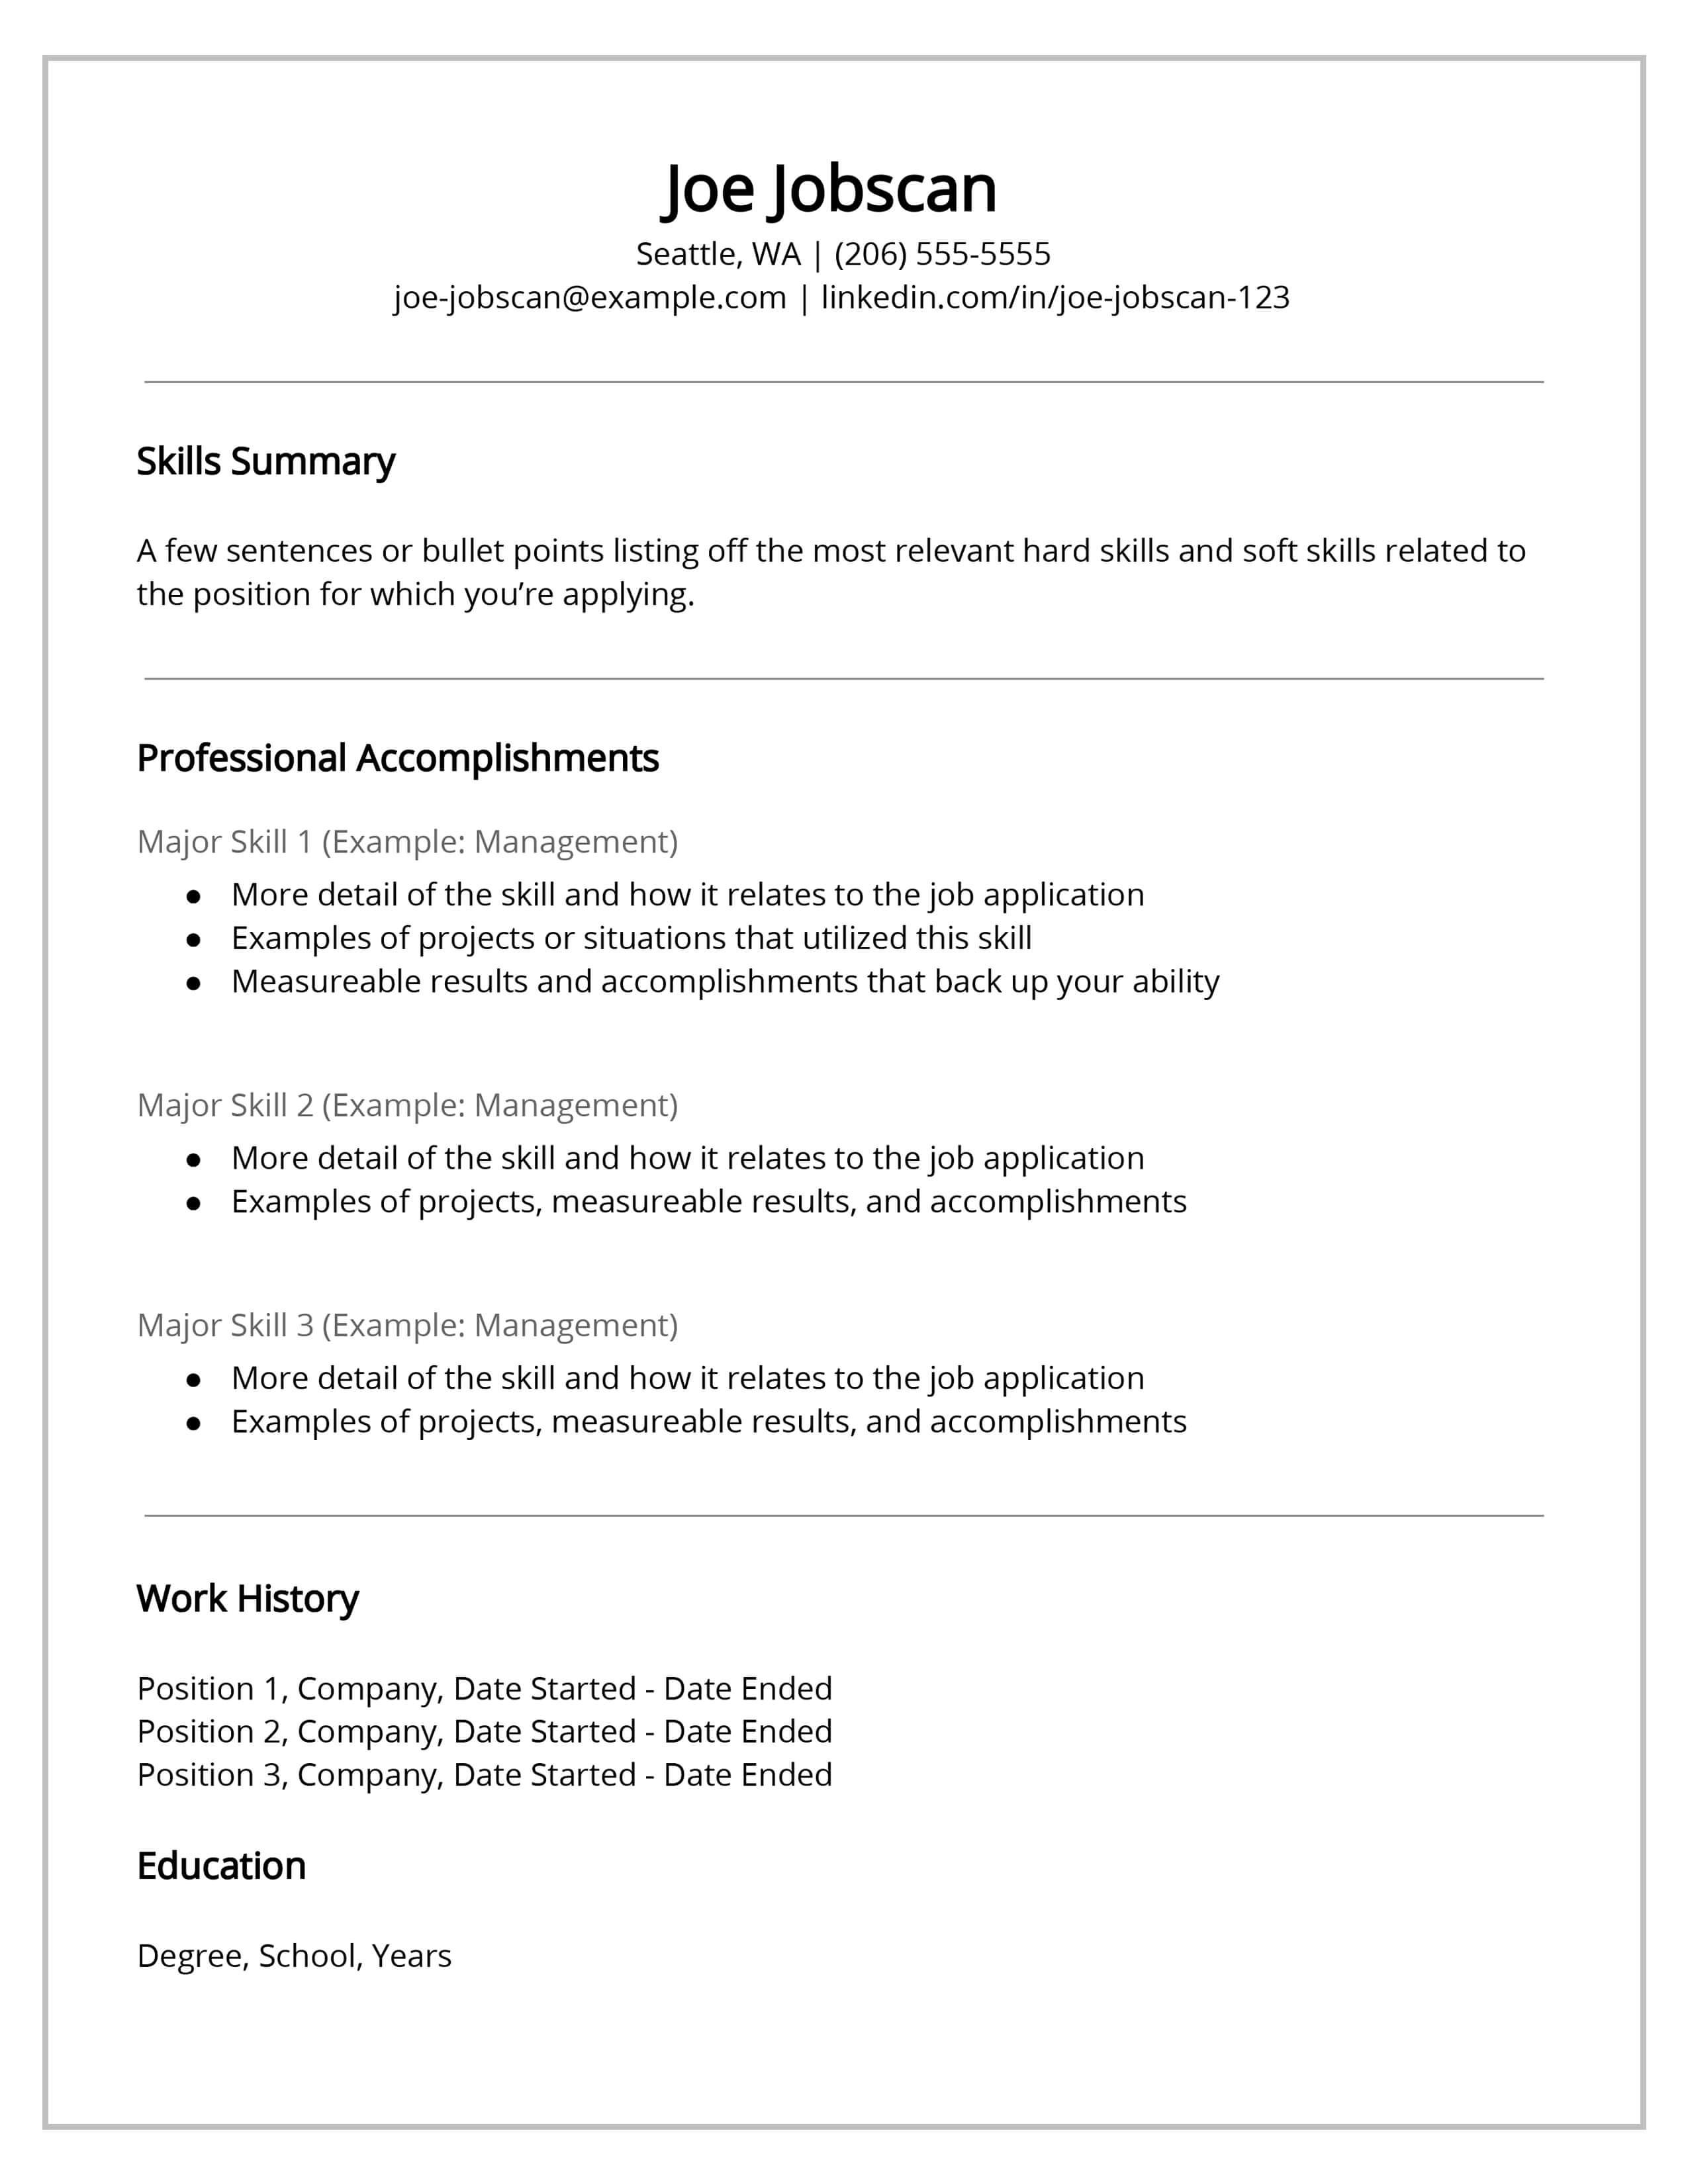 Functional Resume - jobscan.co